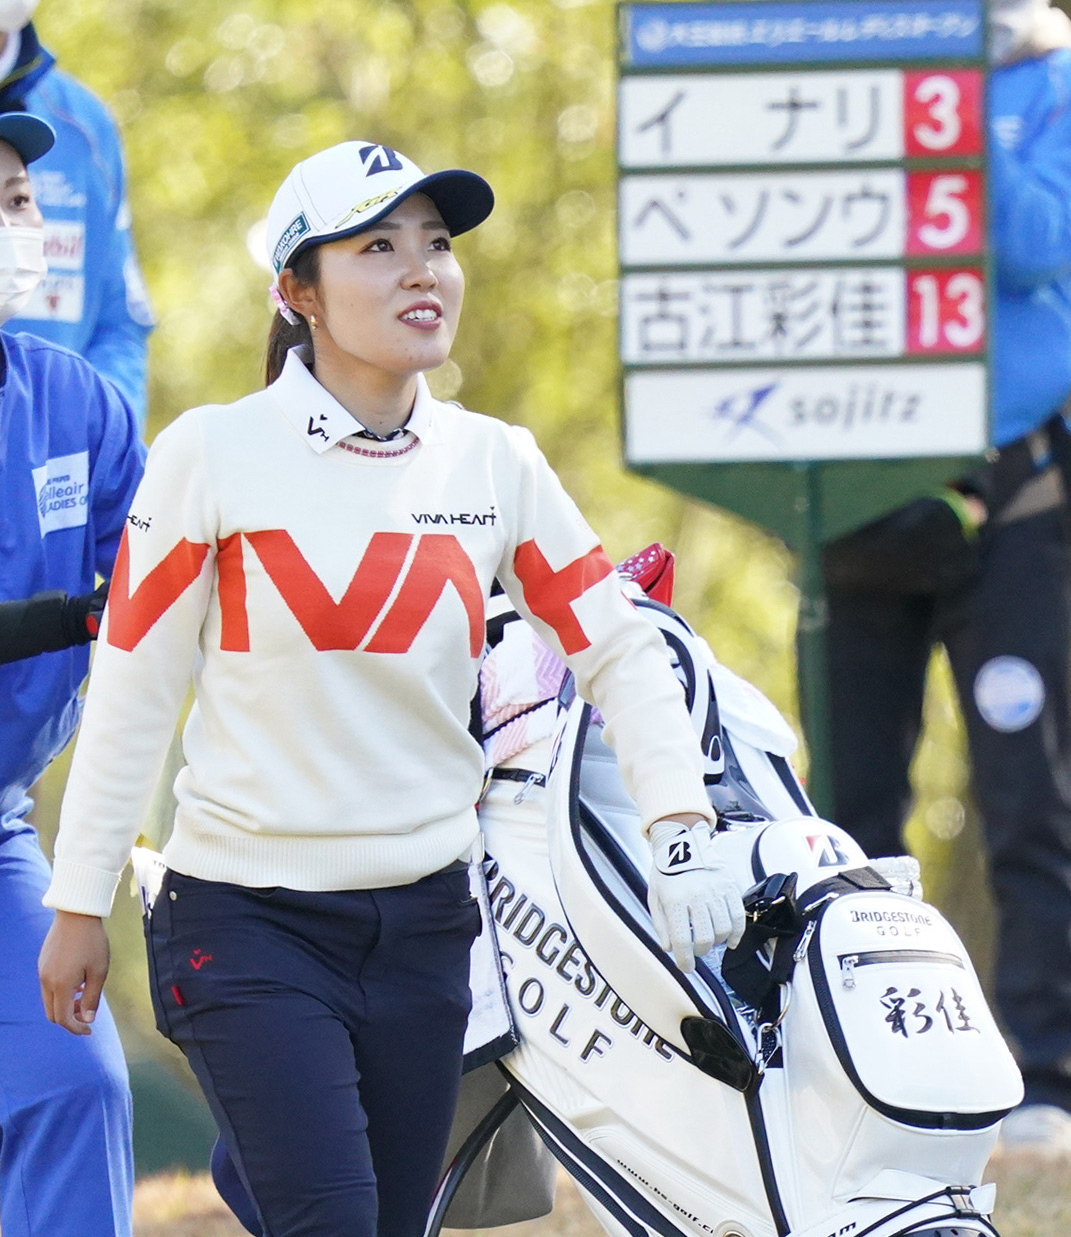 https://www.nikkansports.com/sports/golf/news/img/202011210000060-w1300_8.jpg